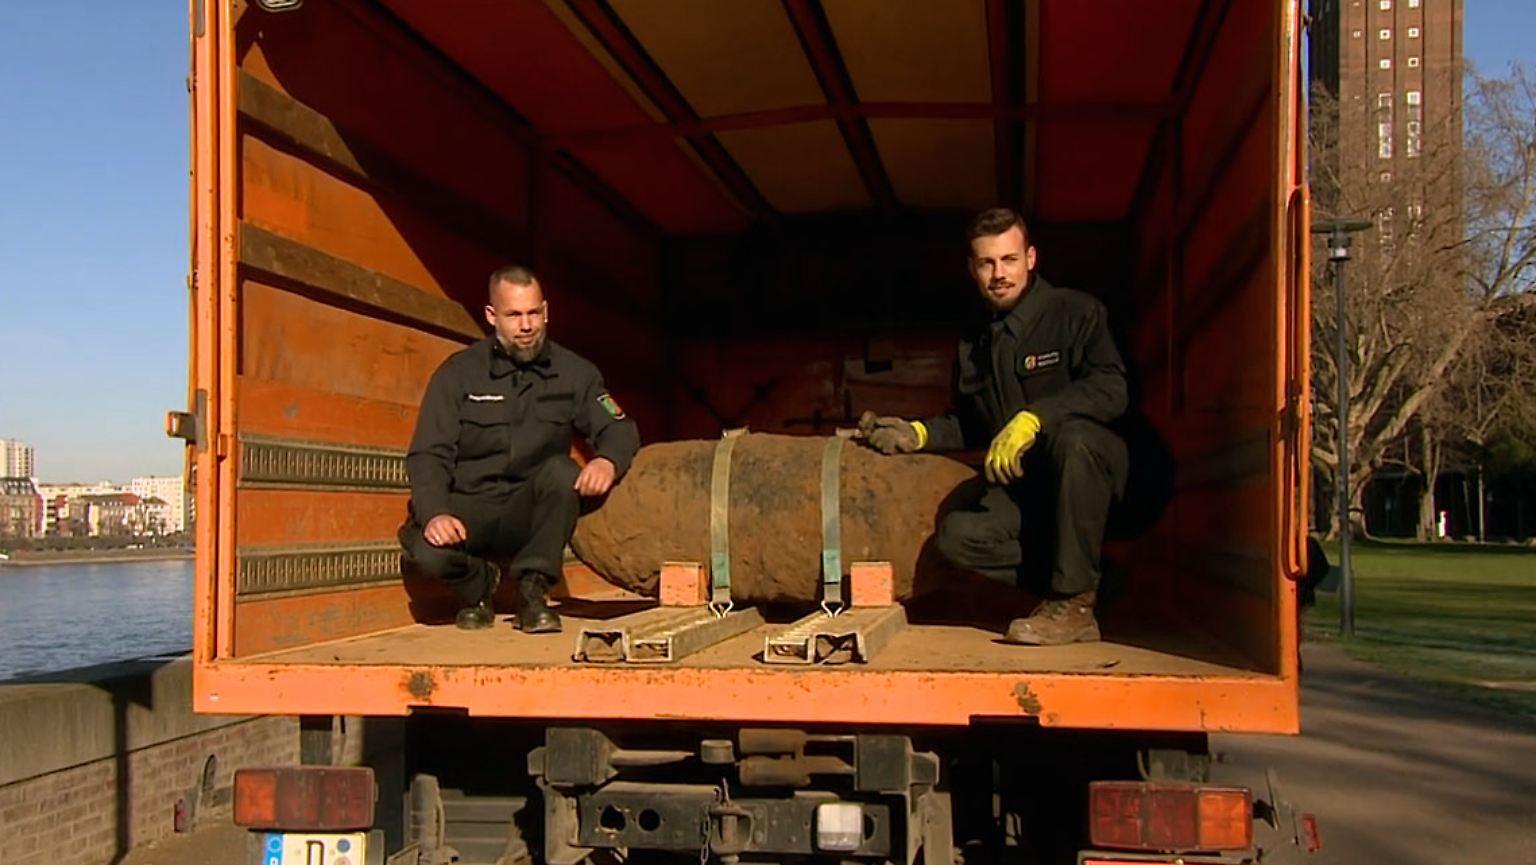 Fernverkehr Lahmgelegt Weltkriegsbombe In Köln Erfolgreich Entschärft Video Ntv